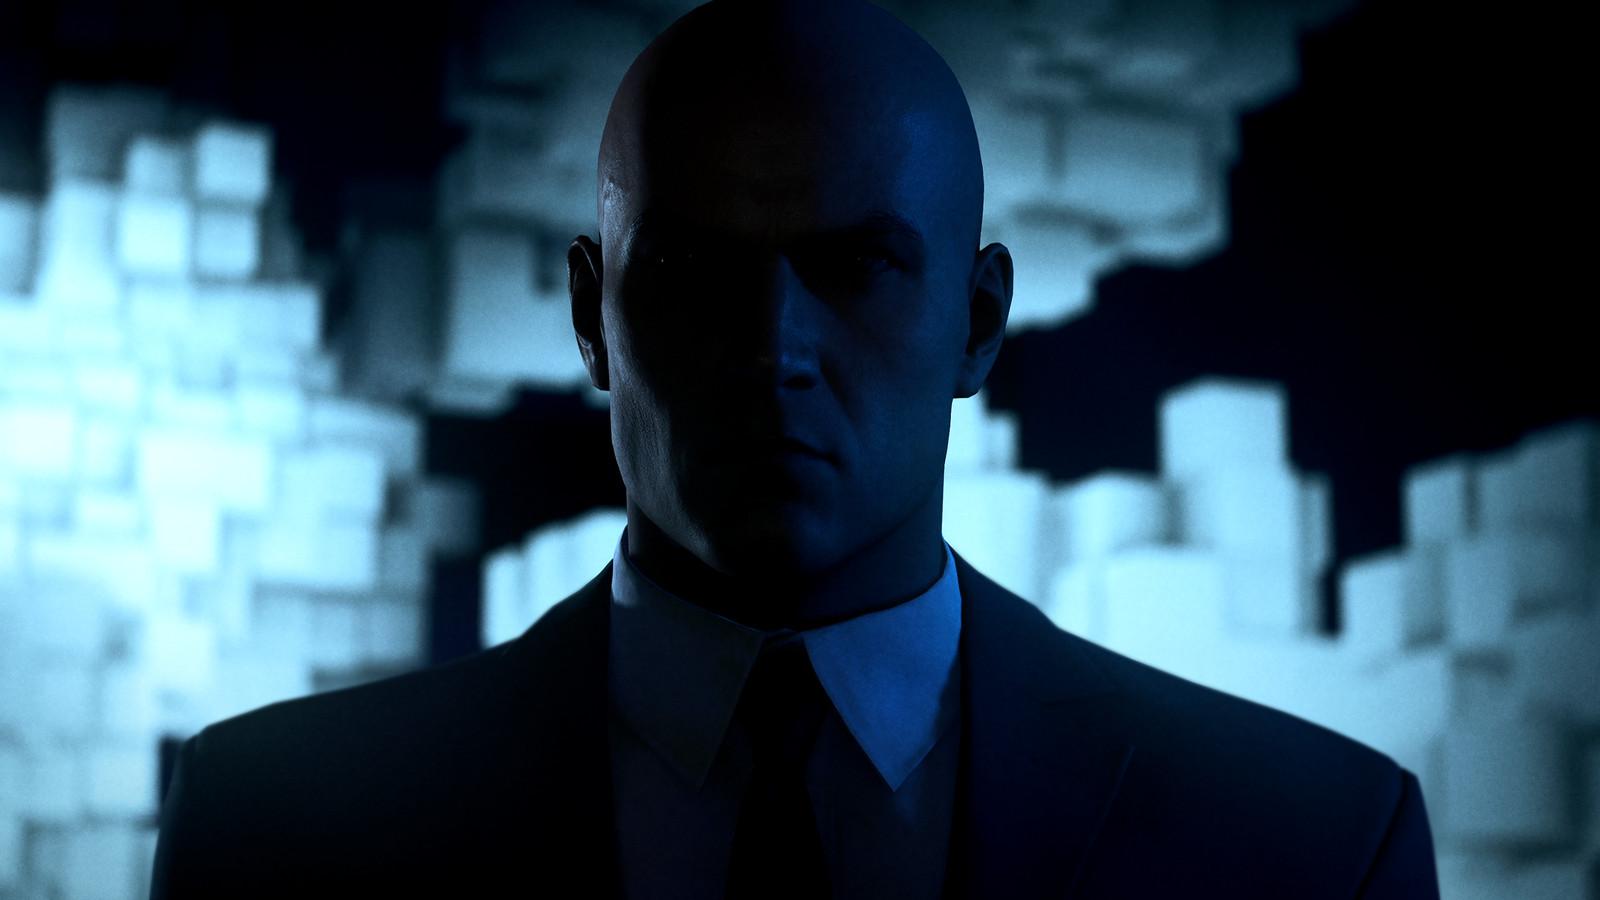 Protagonist Agent 47.